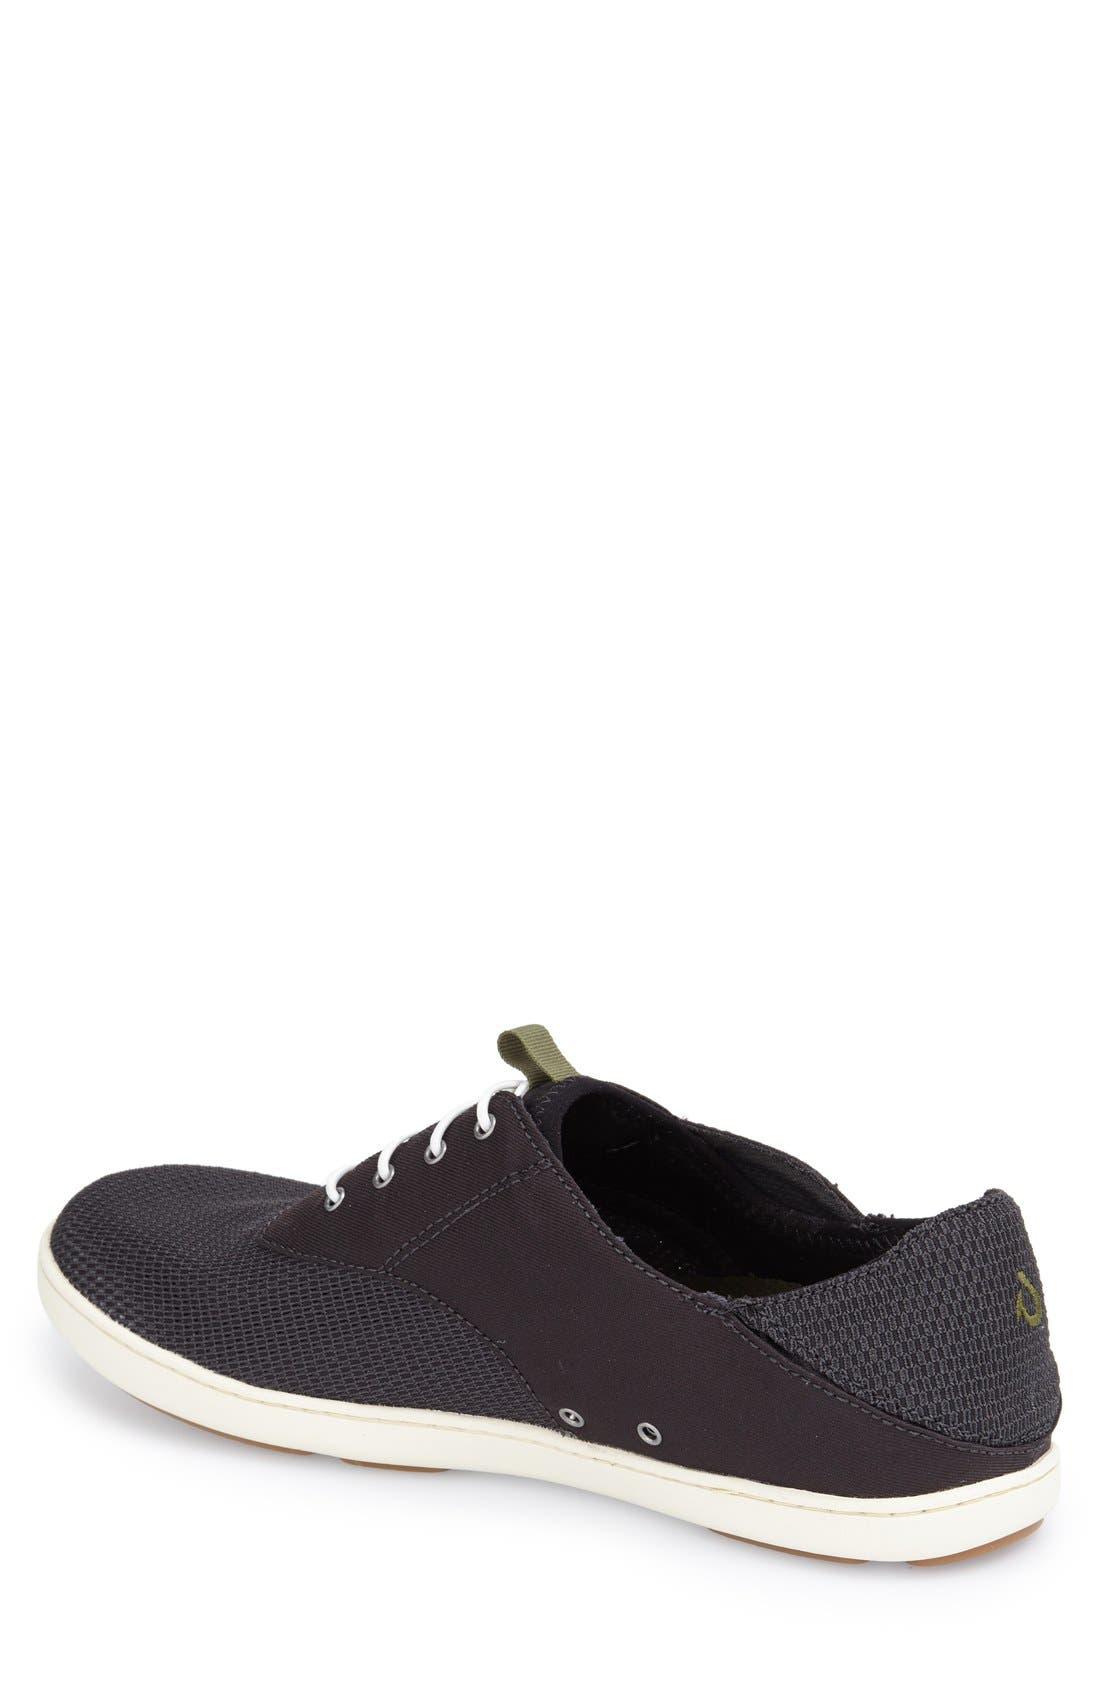 Nohea Moku Sneaker,                             Alternate thumbnail 2, color,                             BLACK/ BLACK